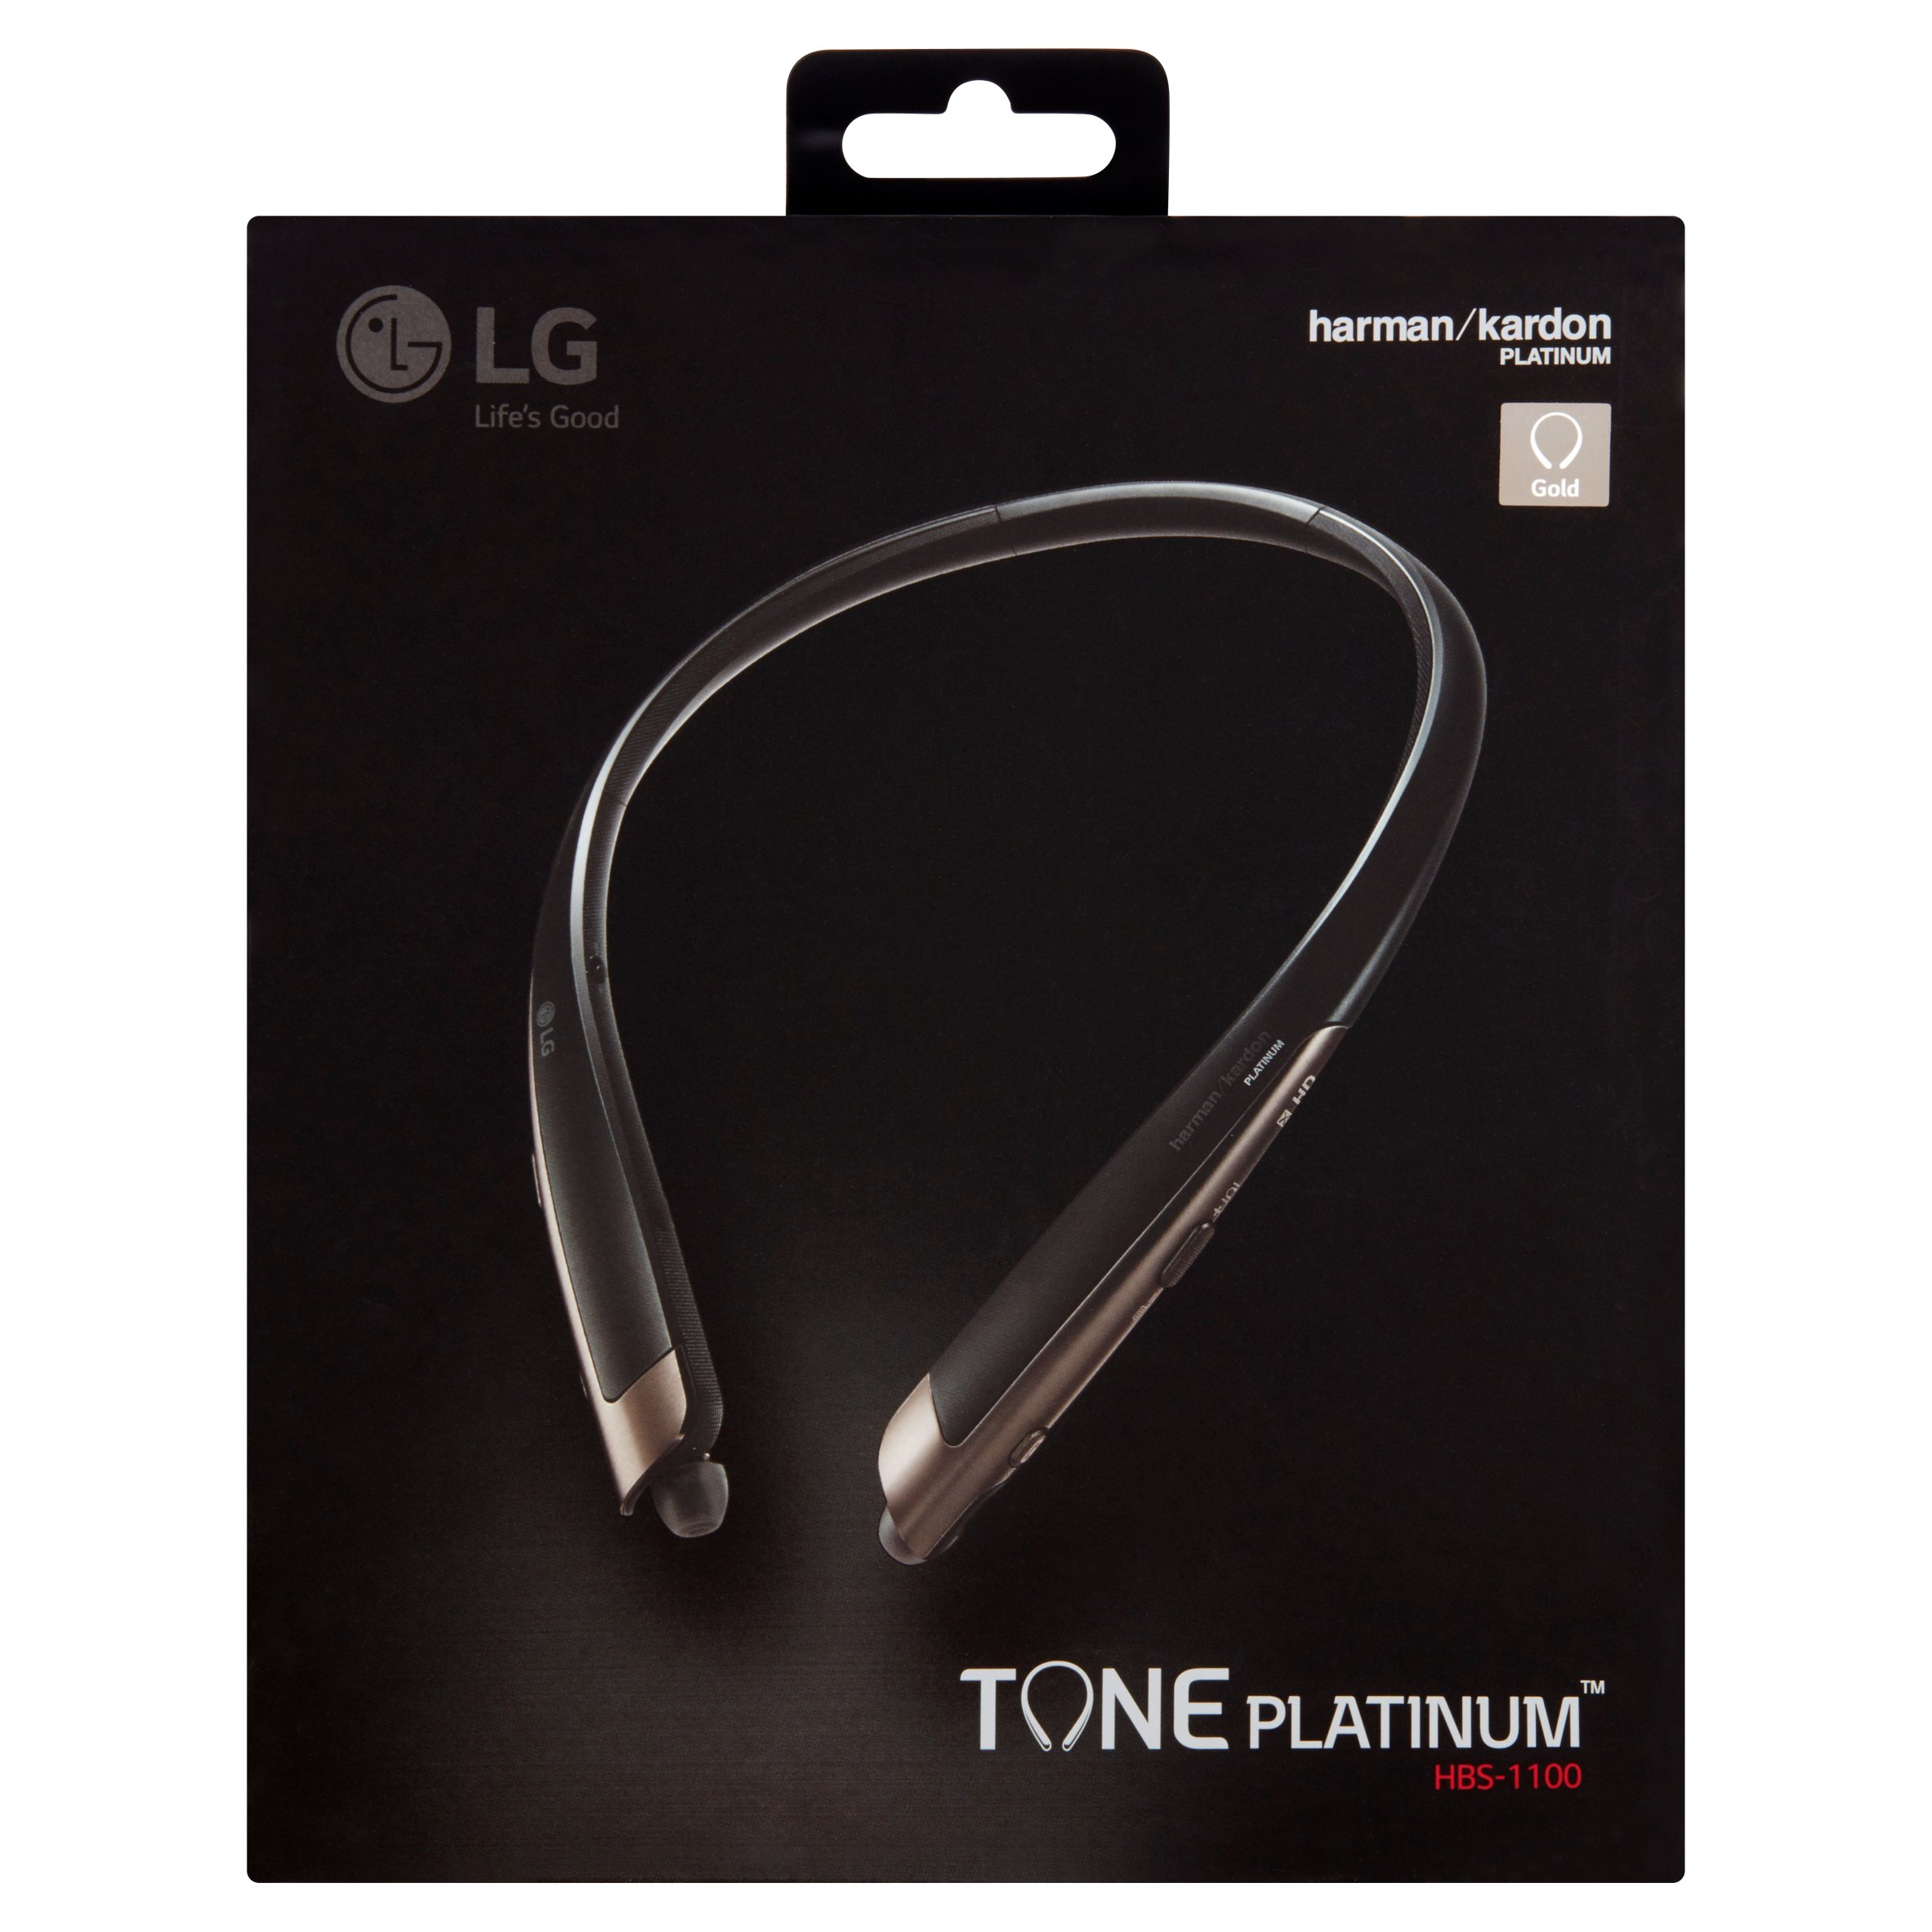 LG Tone Platinum Wireless Bluetooth Stereo Headset